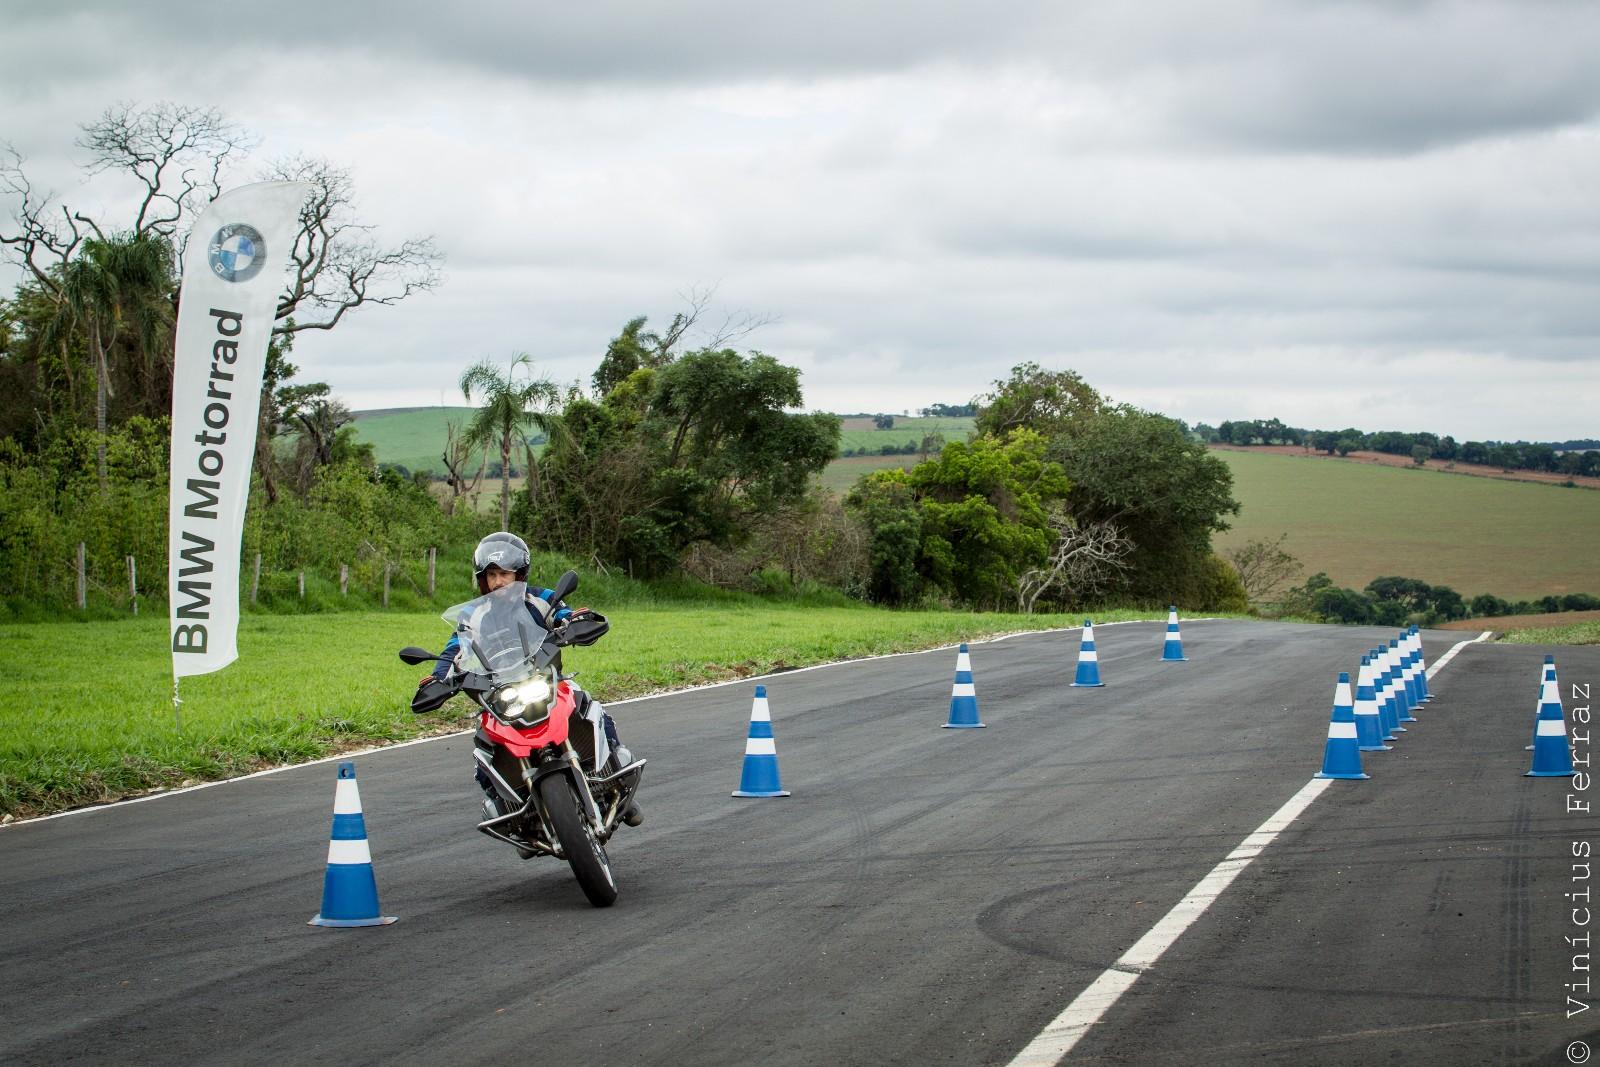 BMW-Rider-Experience_TecnicasDePilotagemOnRoad